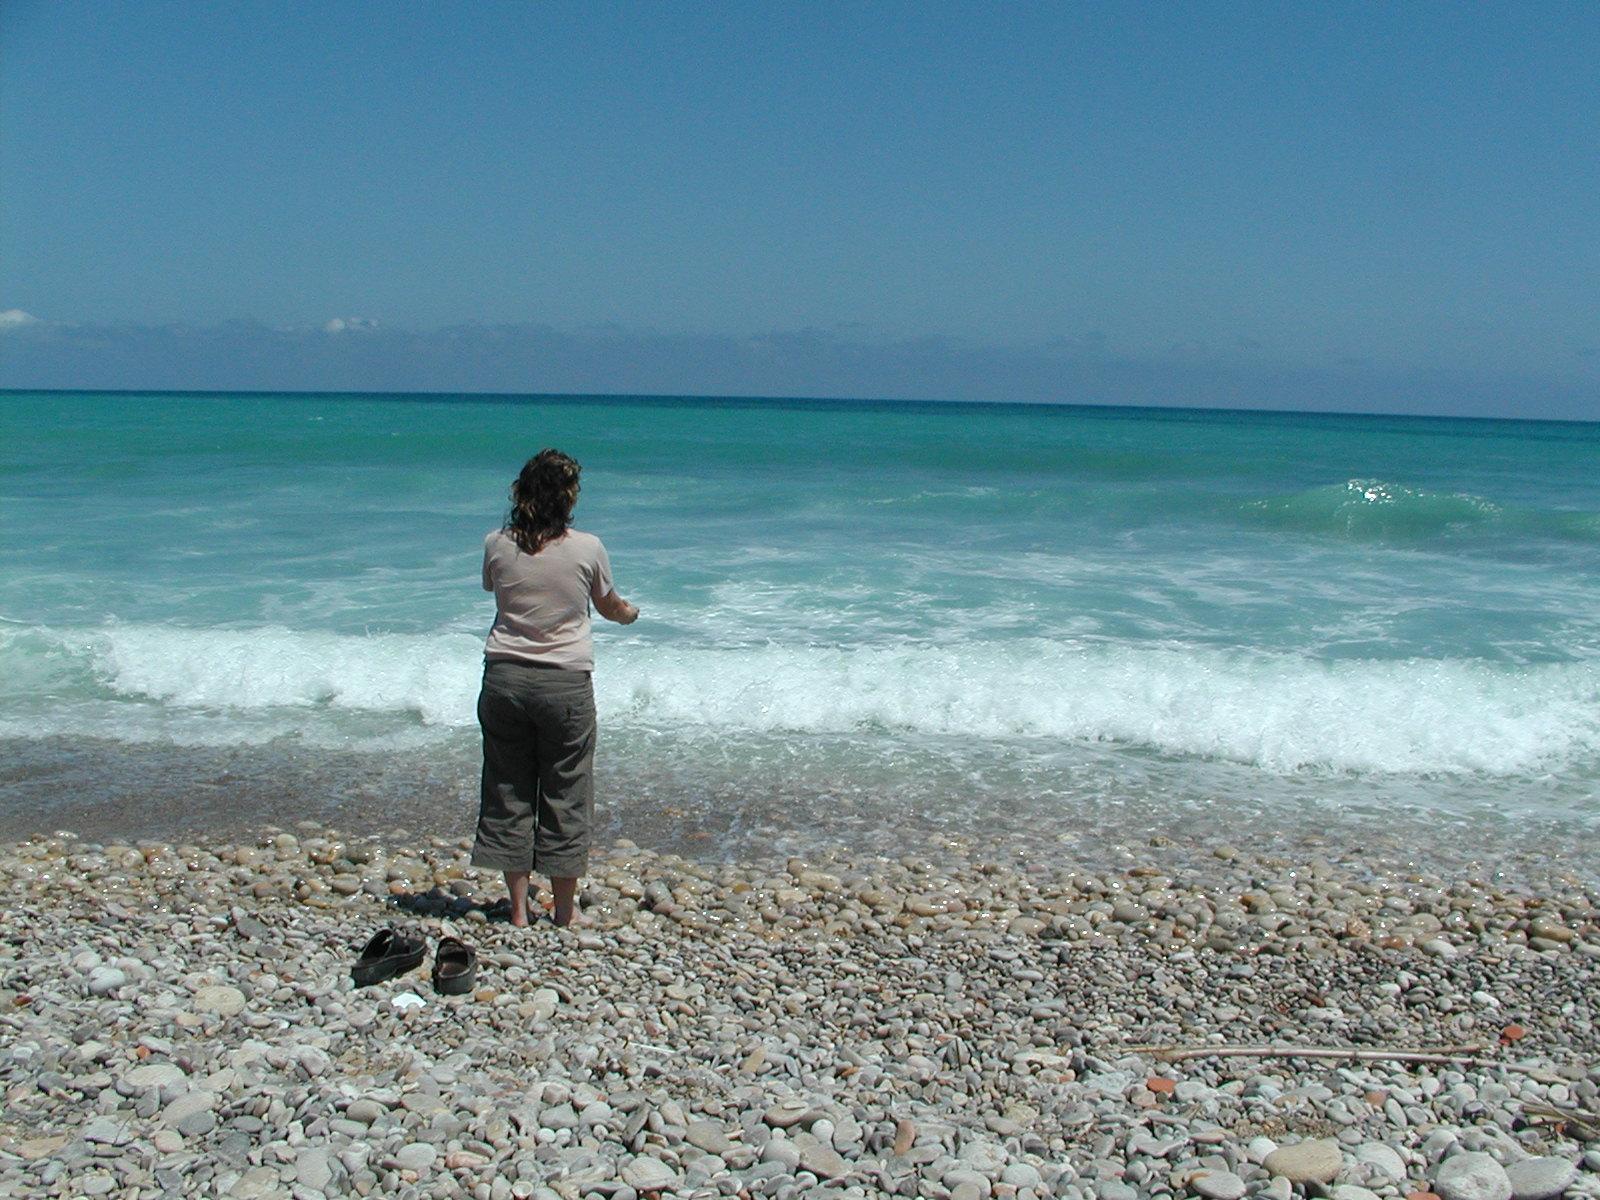 Playa D'Aiguaoliva